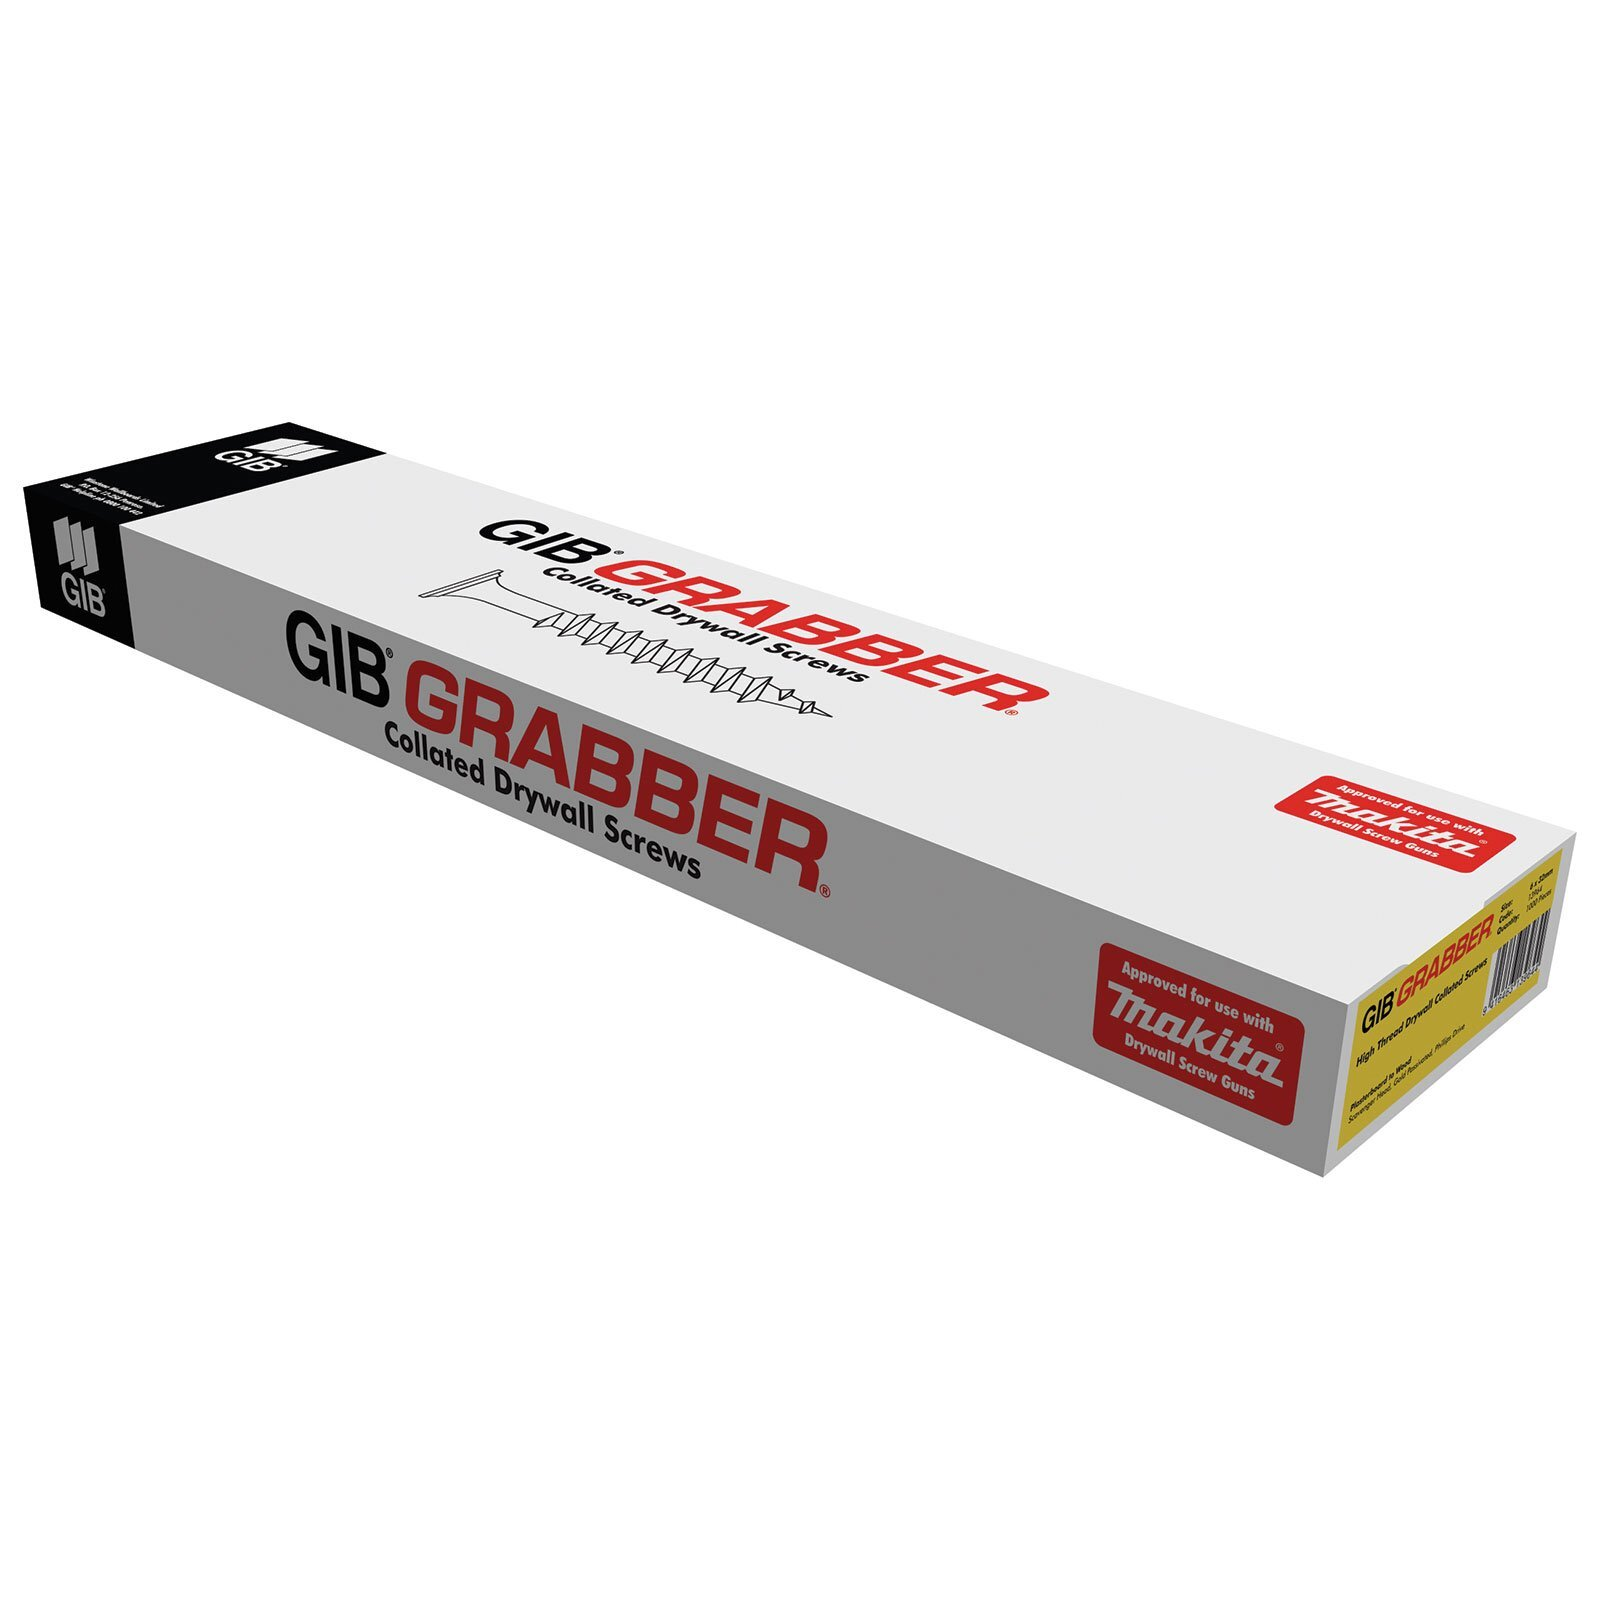 GIB® Grabber® 32x 6 Collated High Thread Screws 1000pk